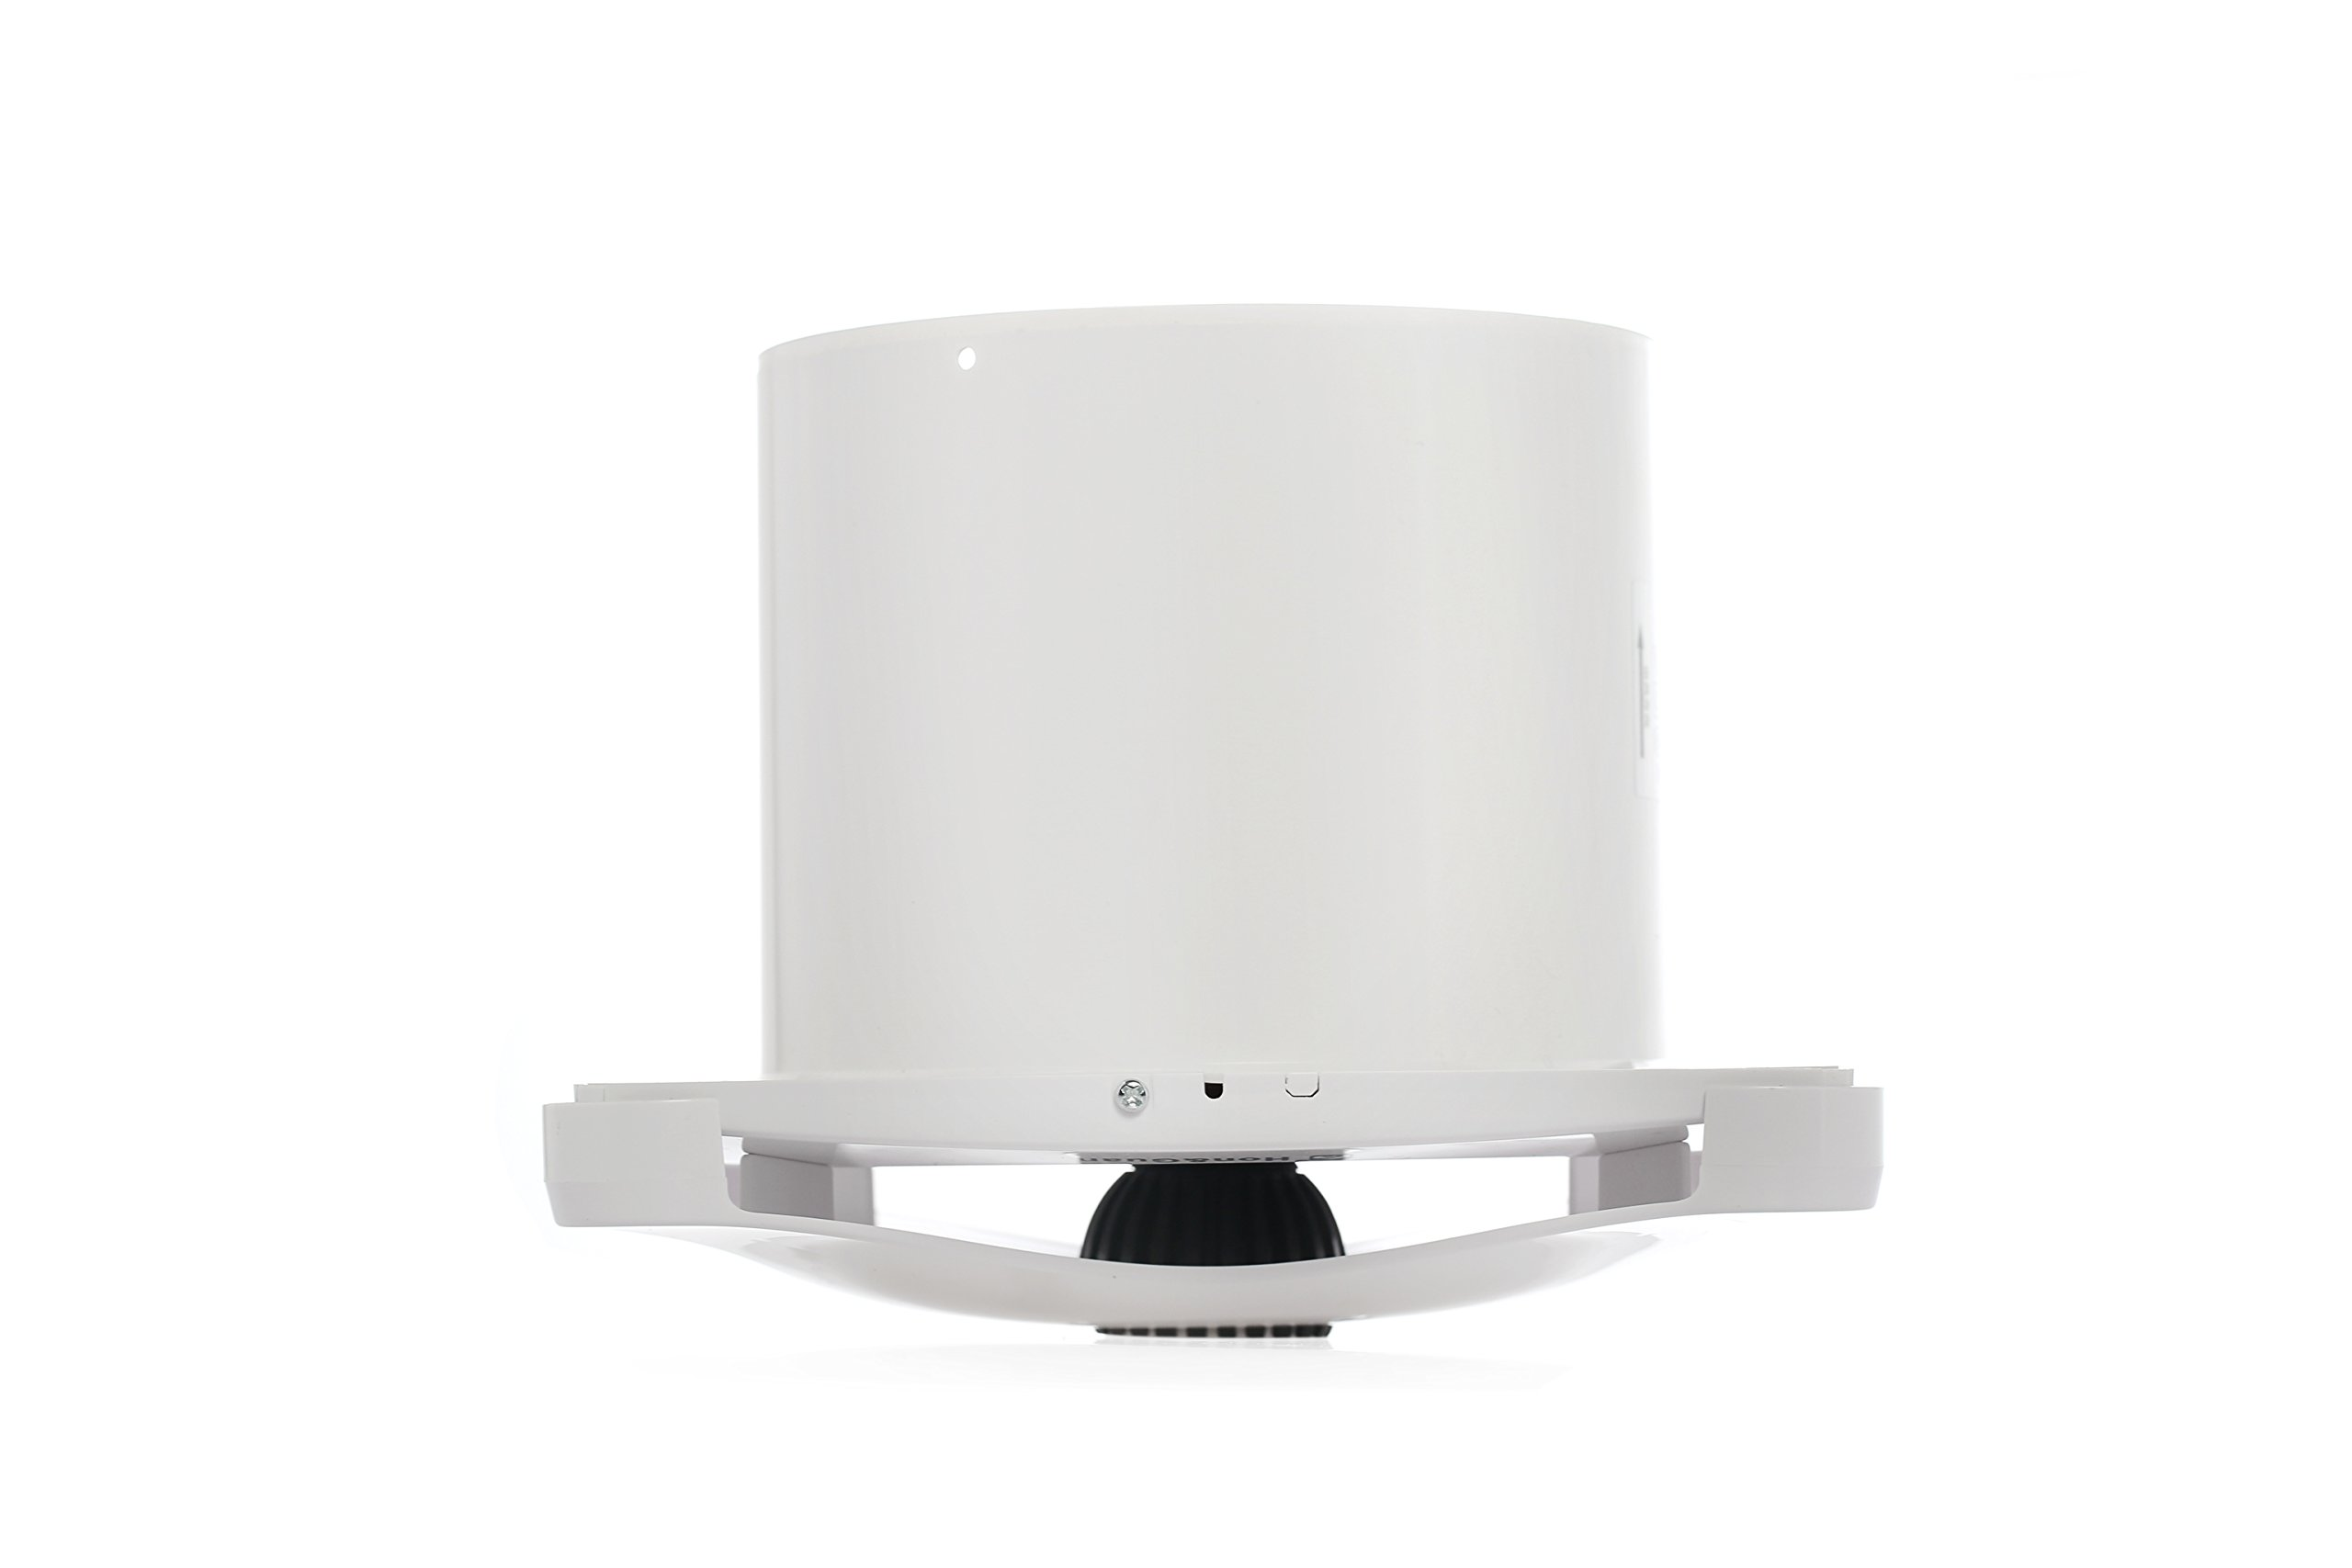 Bathroom Ceiling Ventilation Fan With Light Air Vent